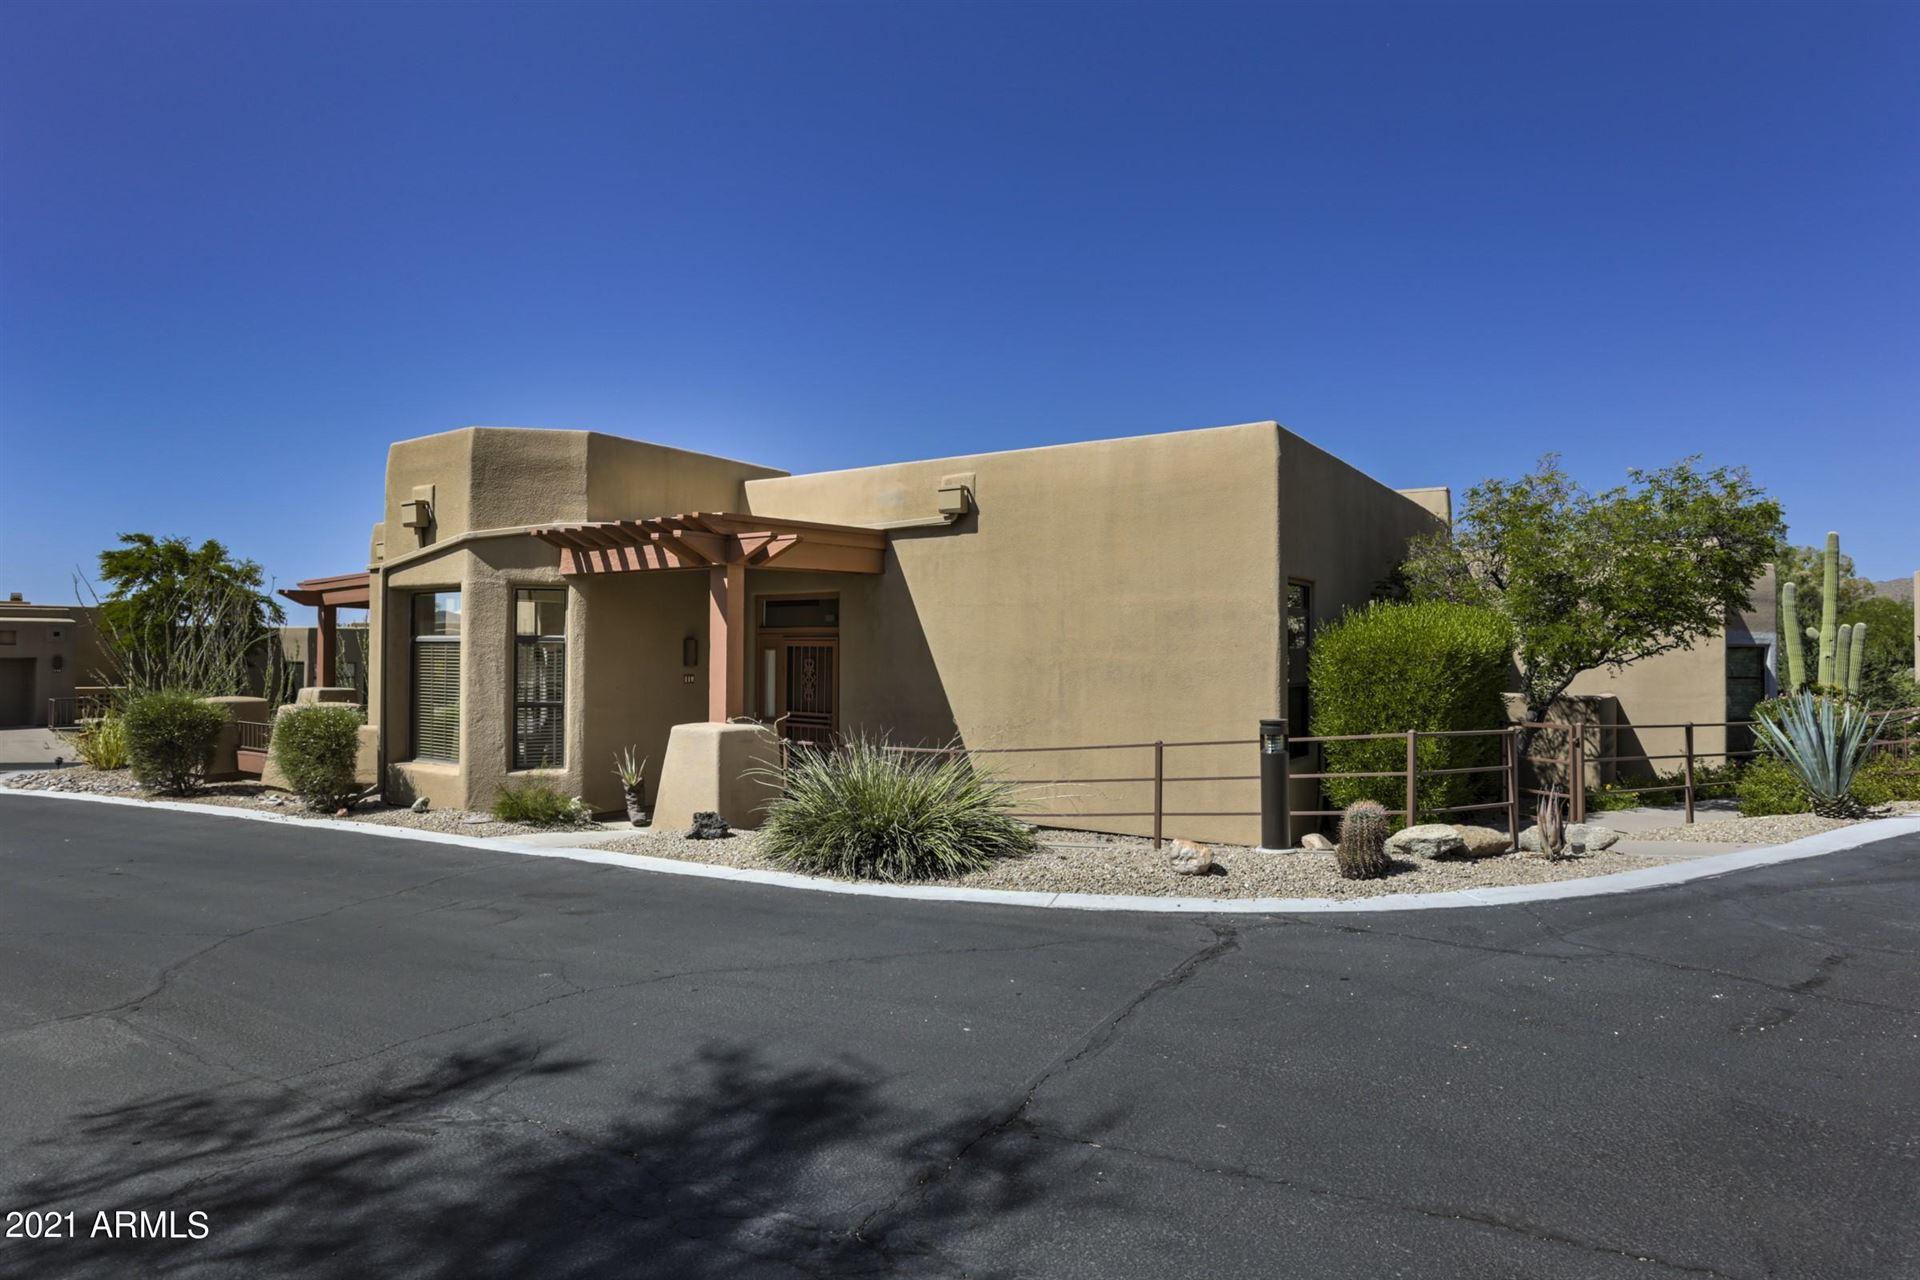 Photo of 13013 N PANORAMA Drive #118, Fountain Hills, AZ 85268 (MLS # 6270104)